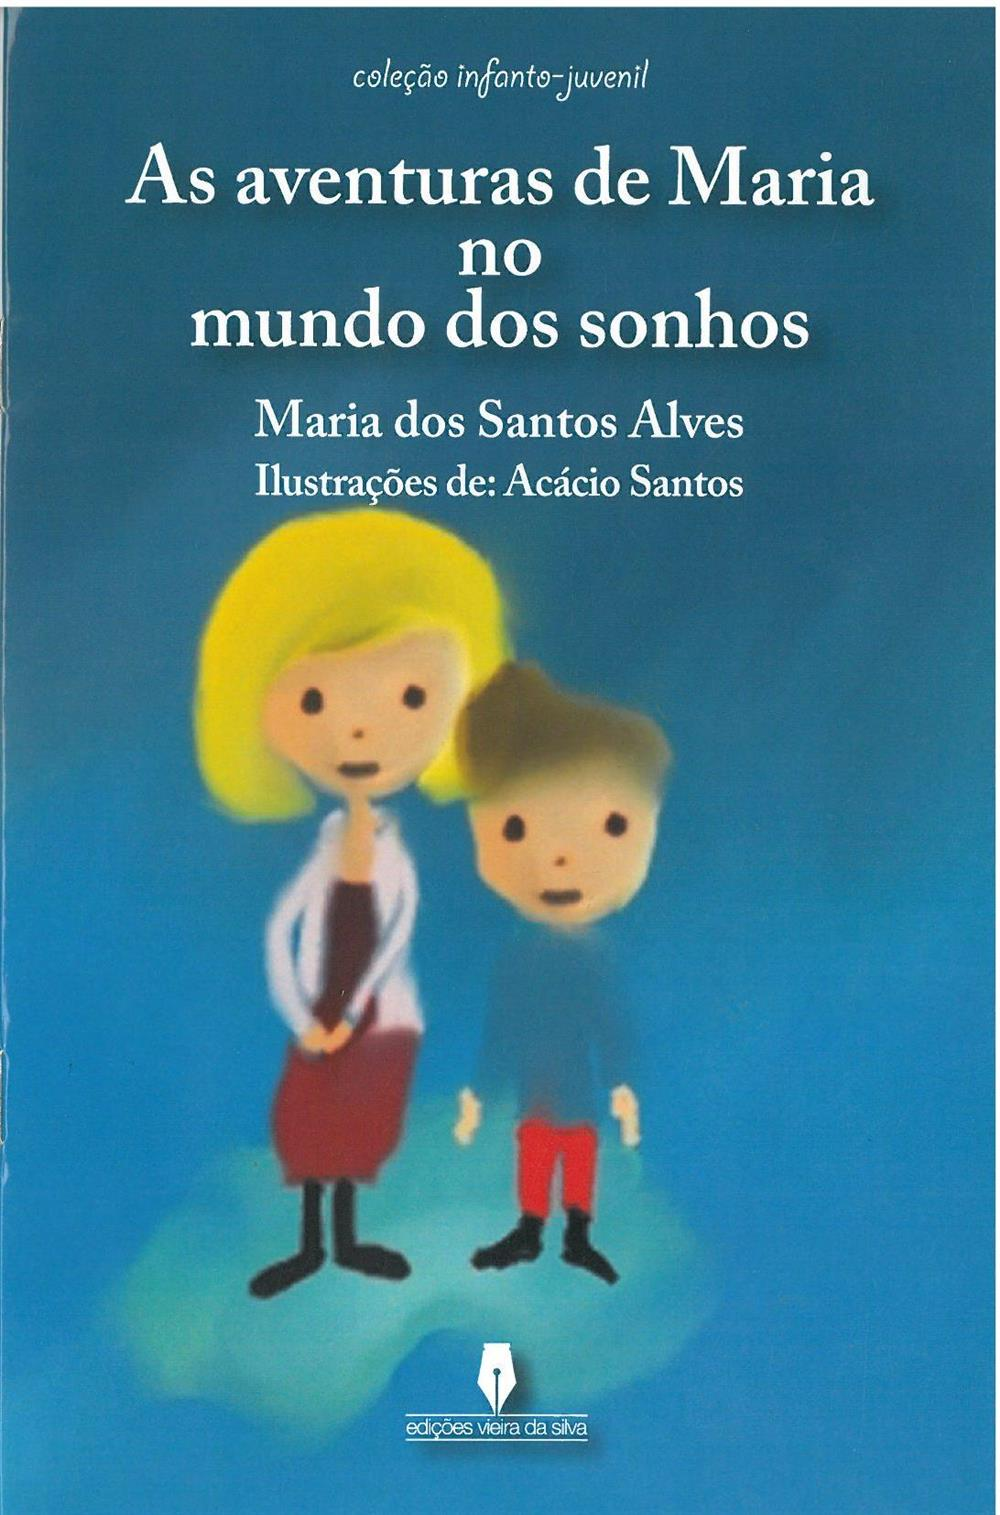 As aventuras de Maria no mundo dos sonhos_.jpg